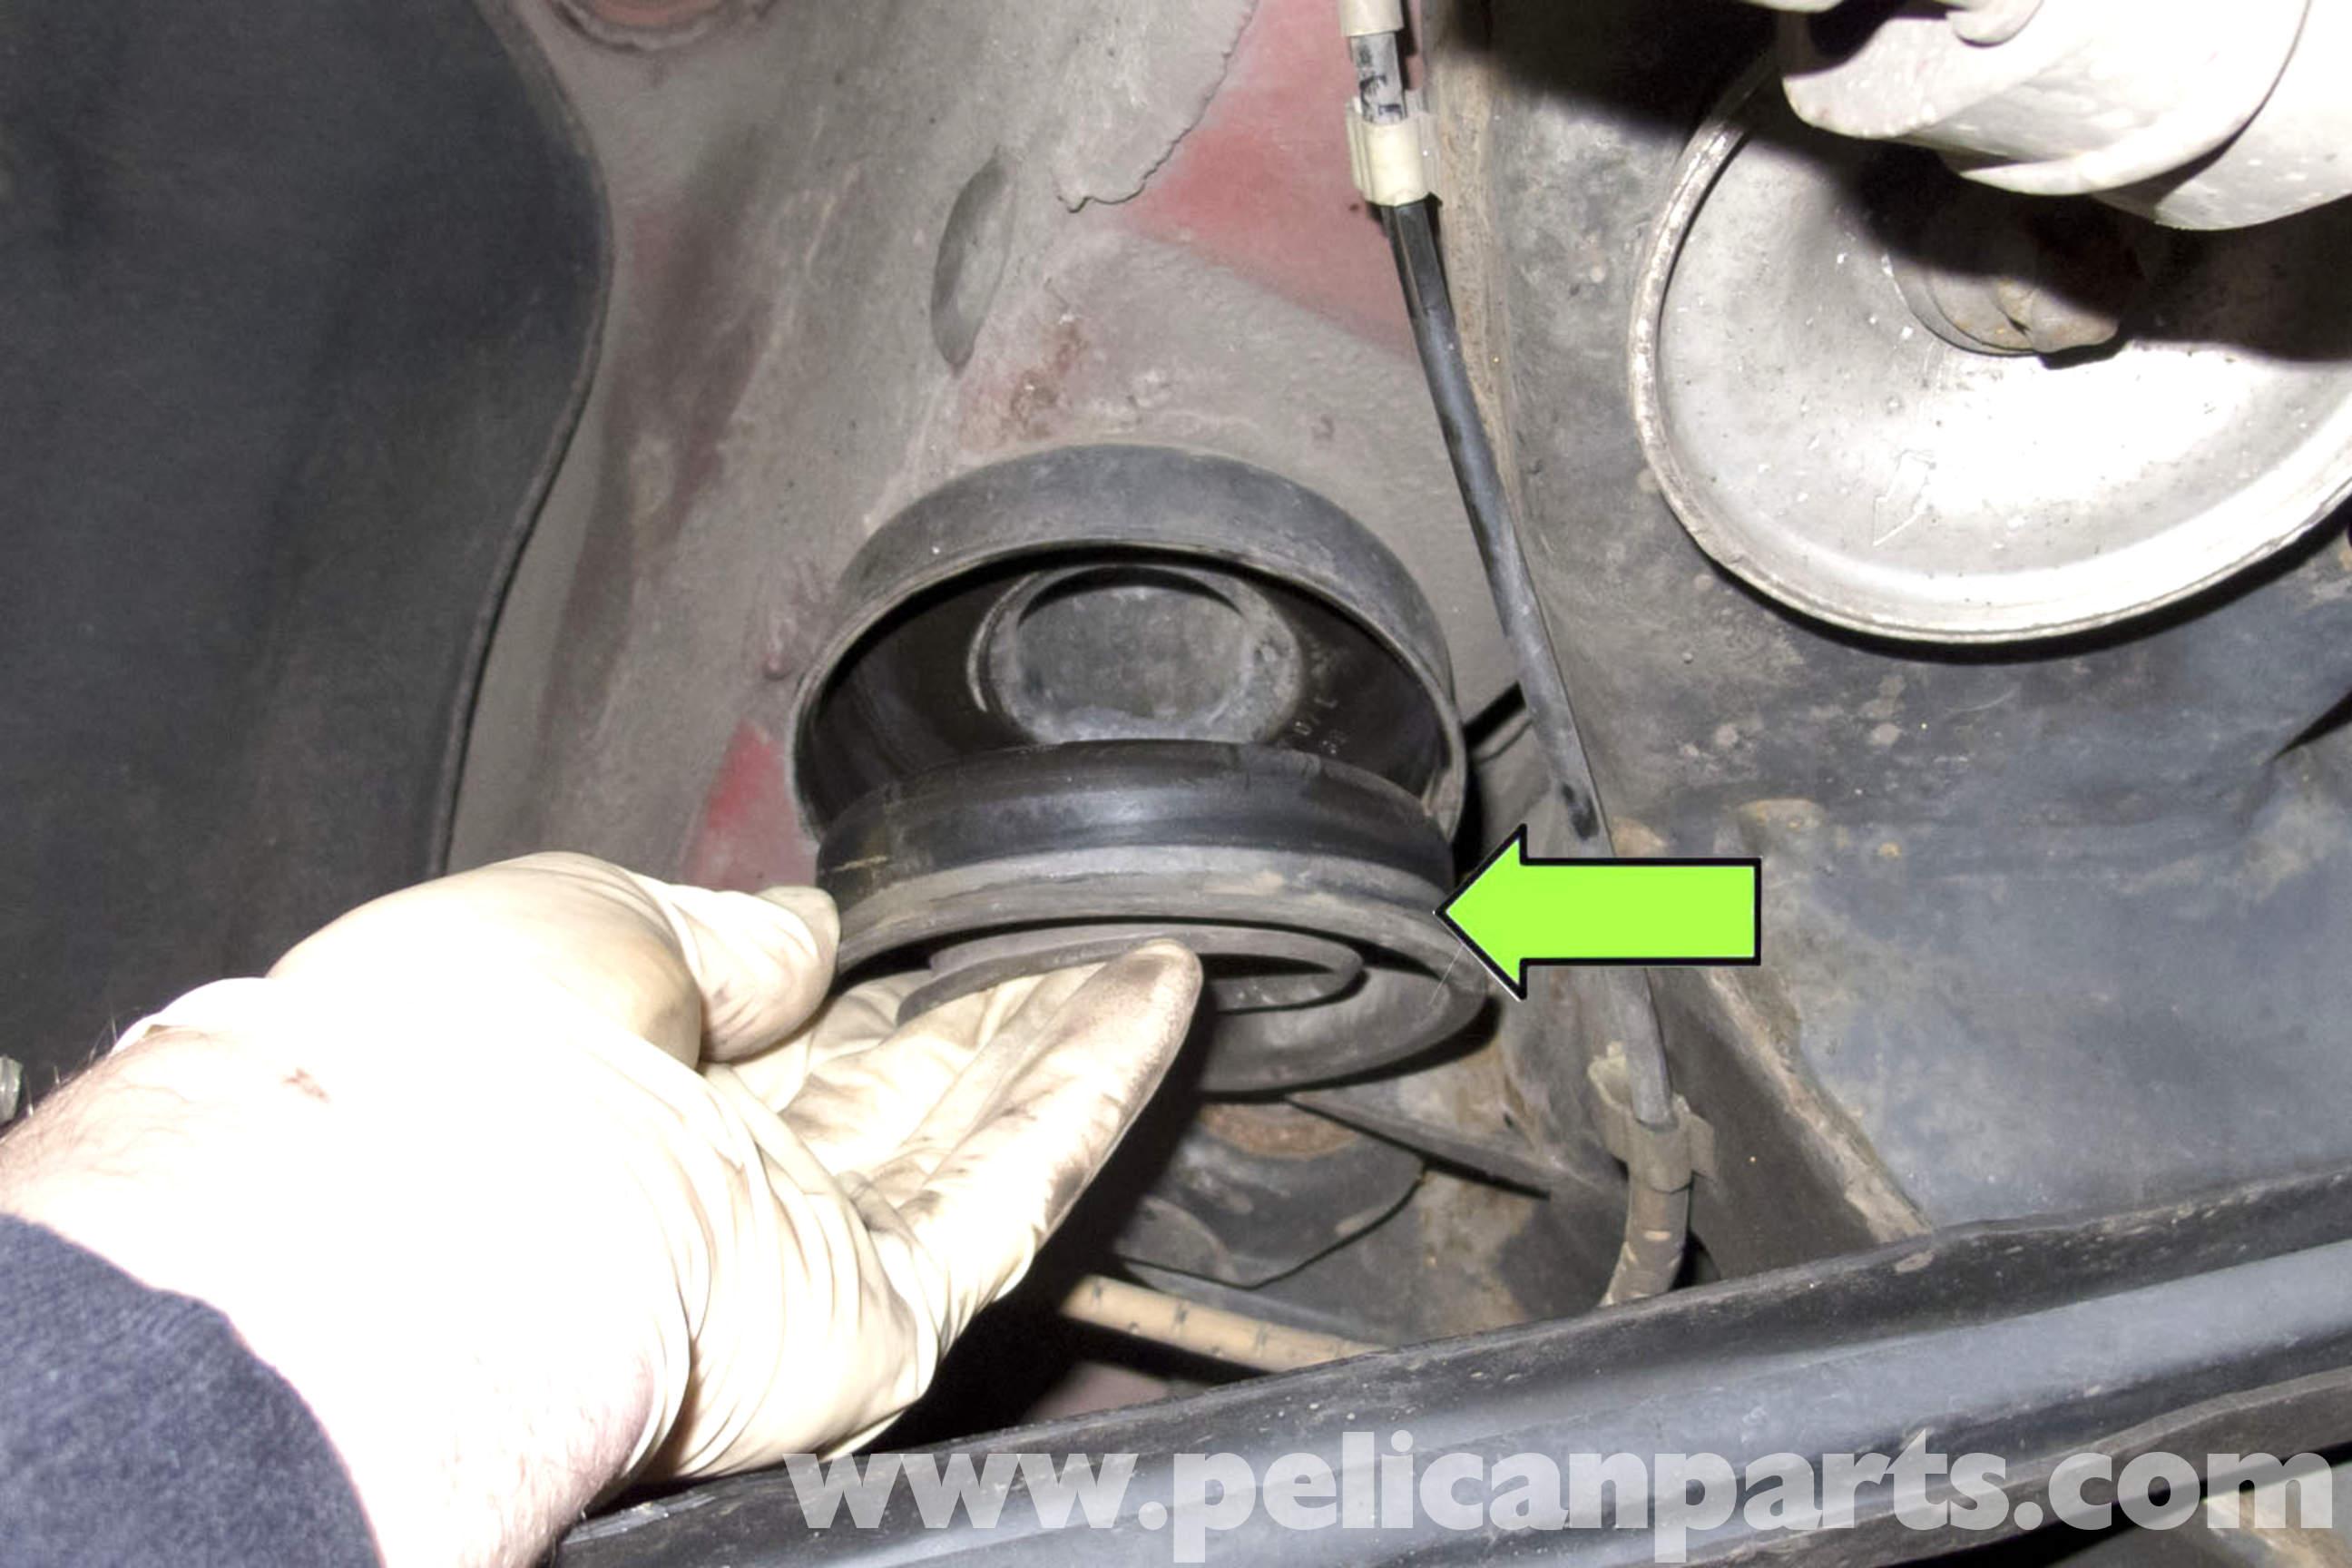 2009 jeep patriot compass service shop repair manual cd dvd brand new oem jeep